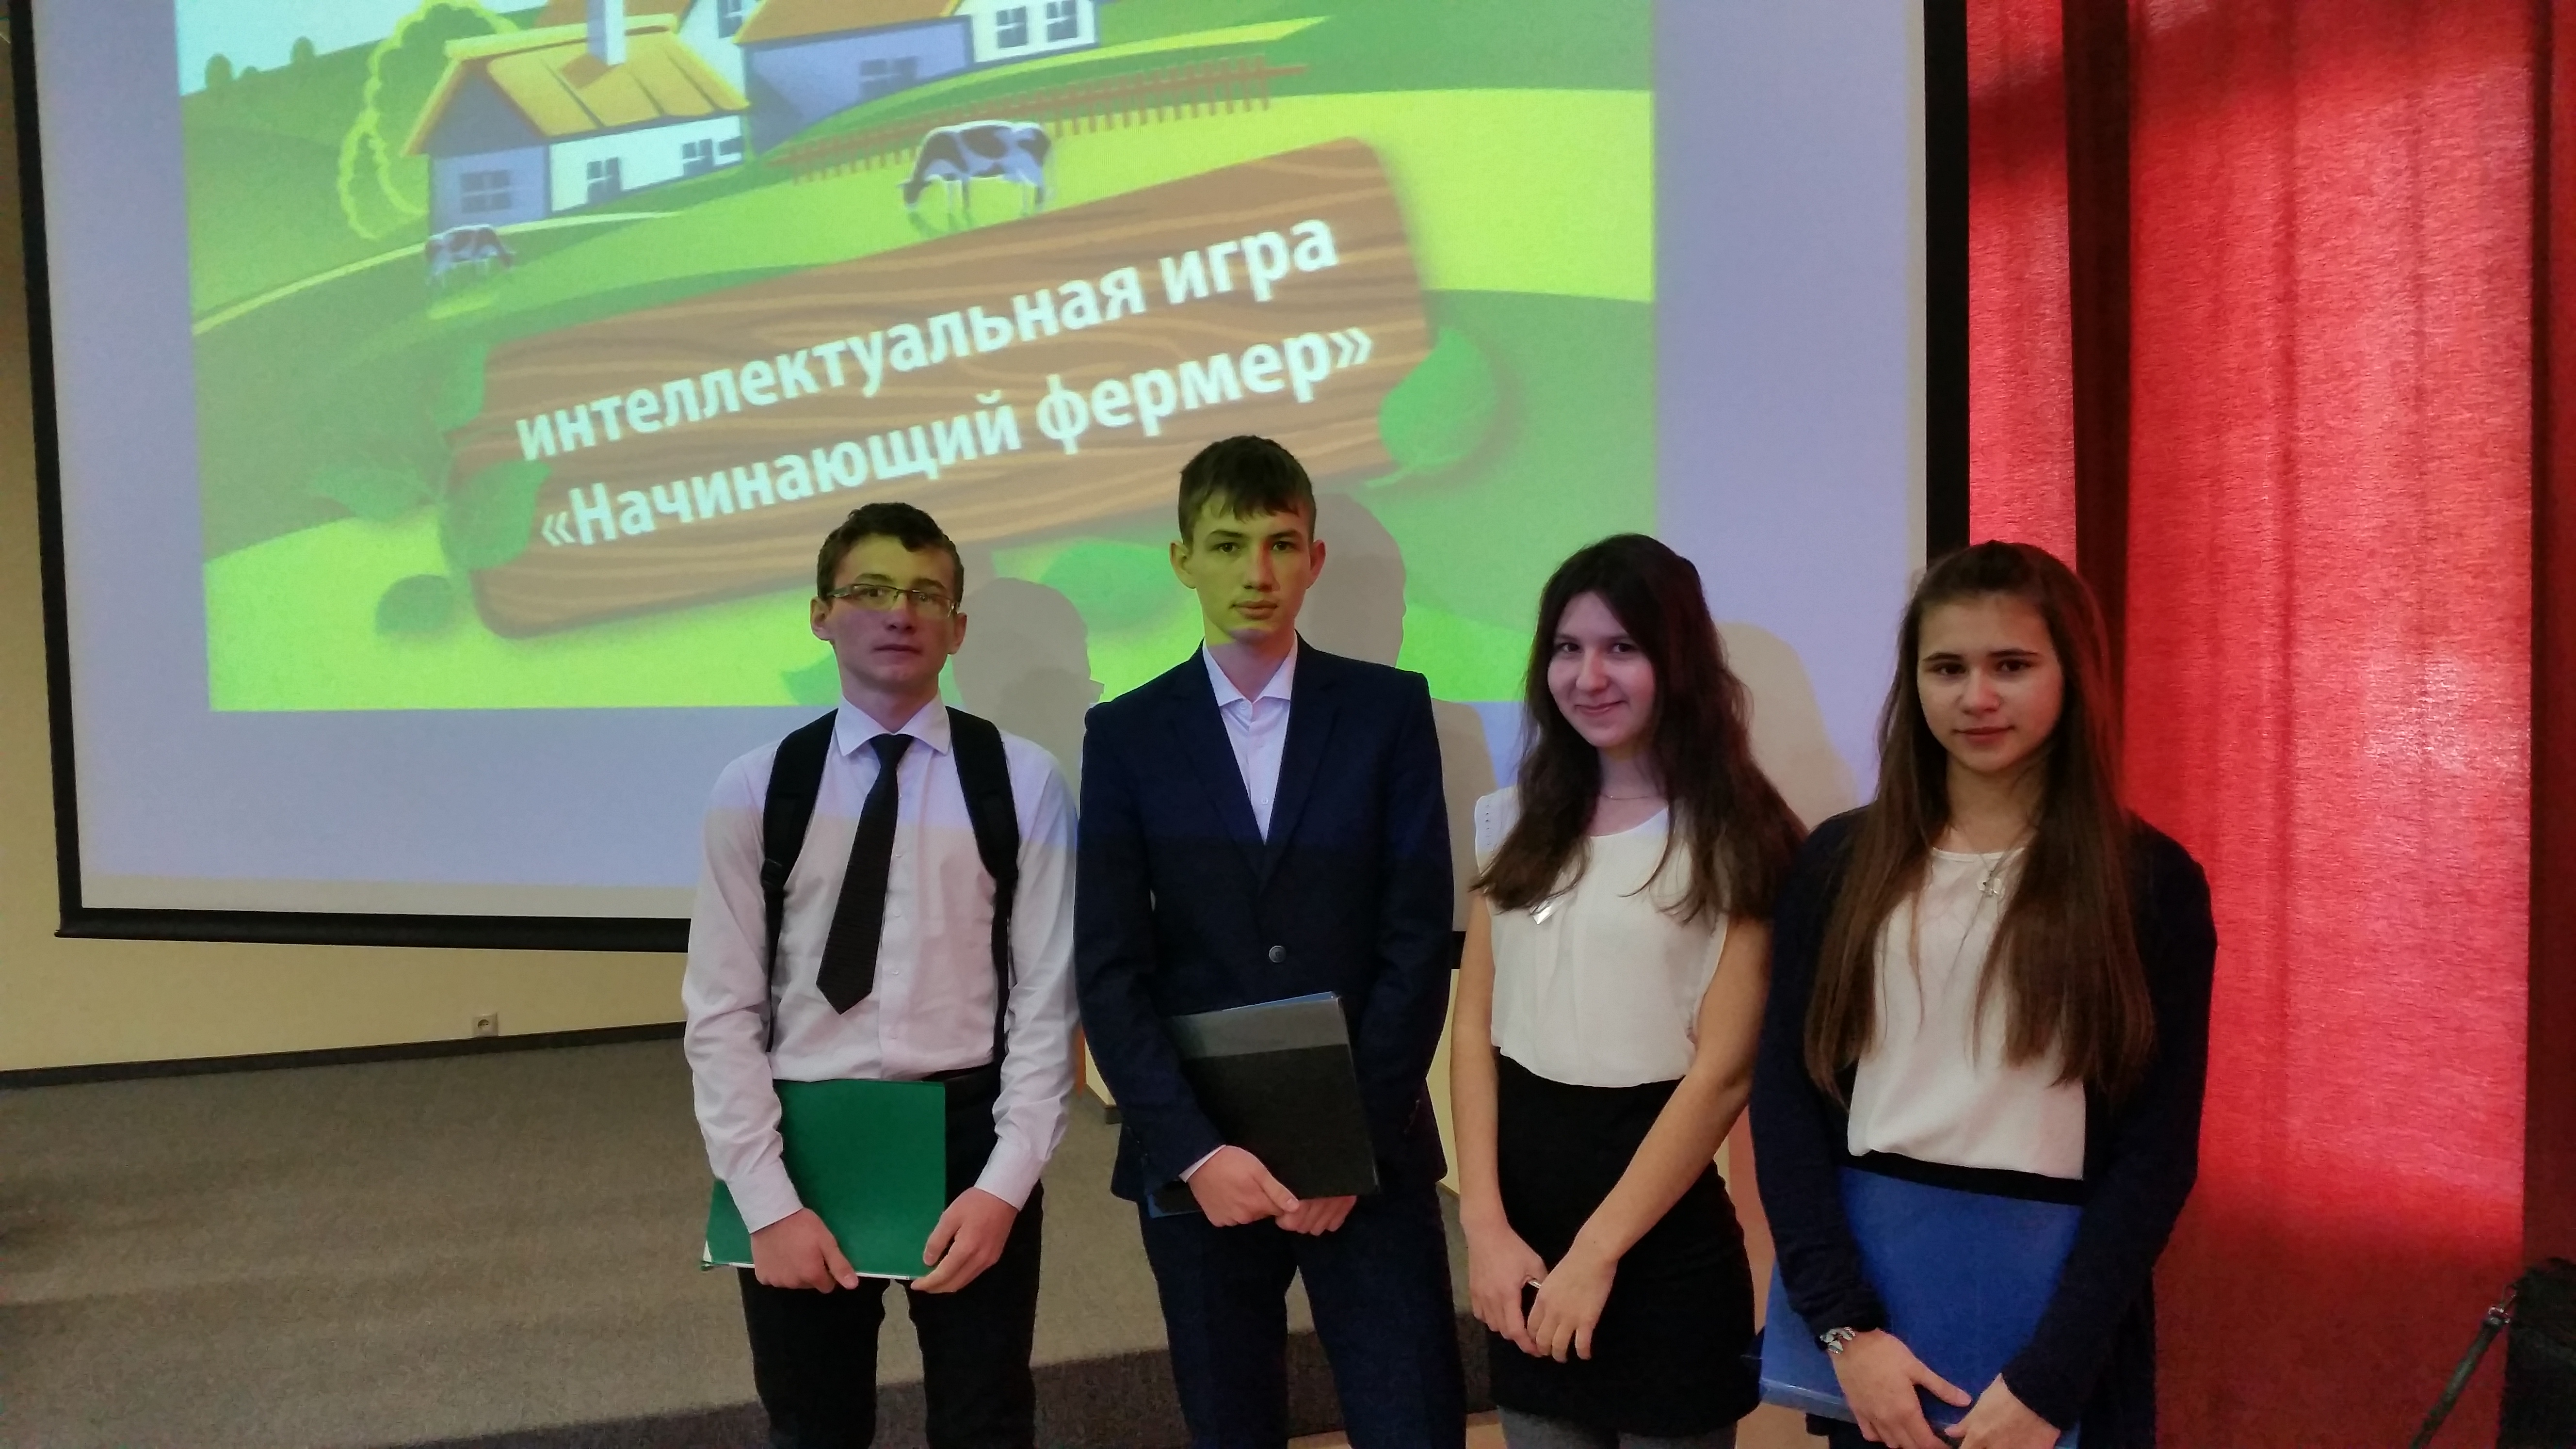 Убейкин Никита - 9 а класс (капитан), Убейкин Руслан - 7 класс, Срурова Диляра - 8 а класс, Лилманова Ляйсан - 10 класс